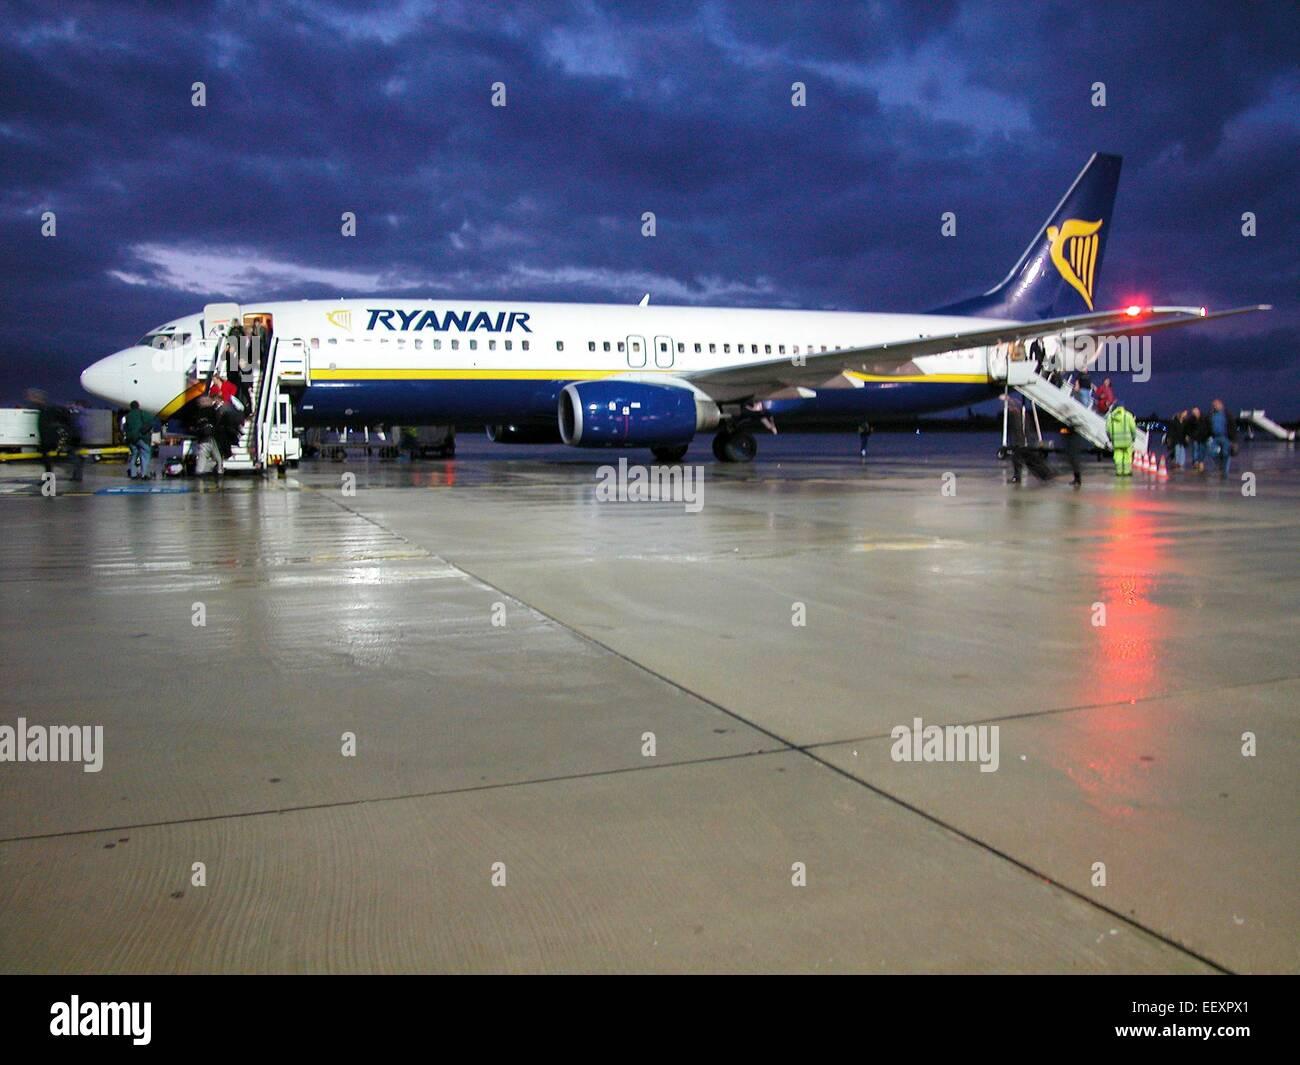 Ryan air Ryanair cut price airline aircraft on tarmac at Frankfurt  Hahn - Stock Image